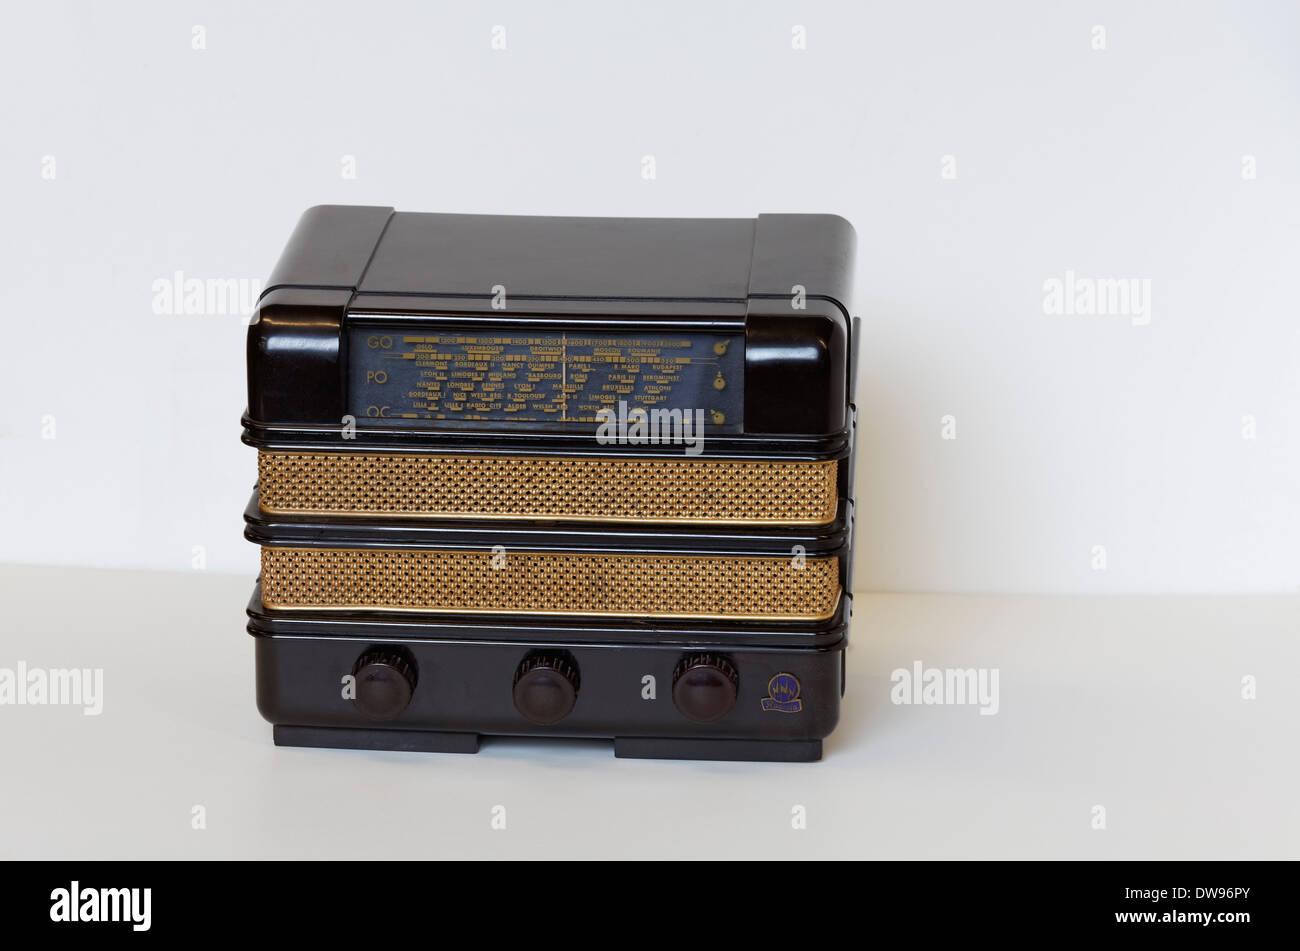 Philips Radiola, miniature radio from 1939, Bakelite housing, Radio Museum Duisburg, North Rhine-Westphalia, Germany - Stock Image